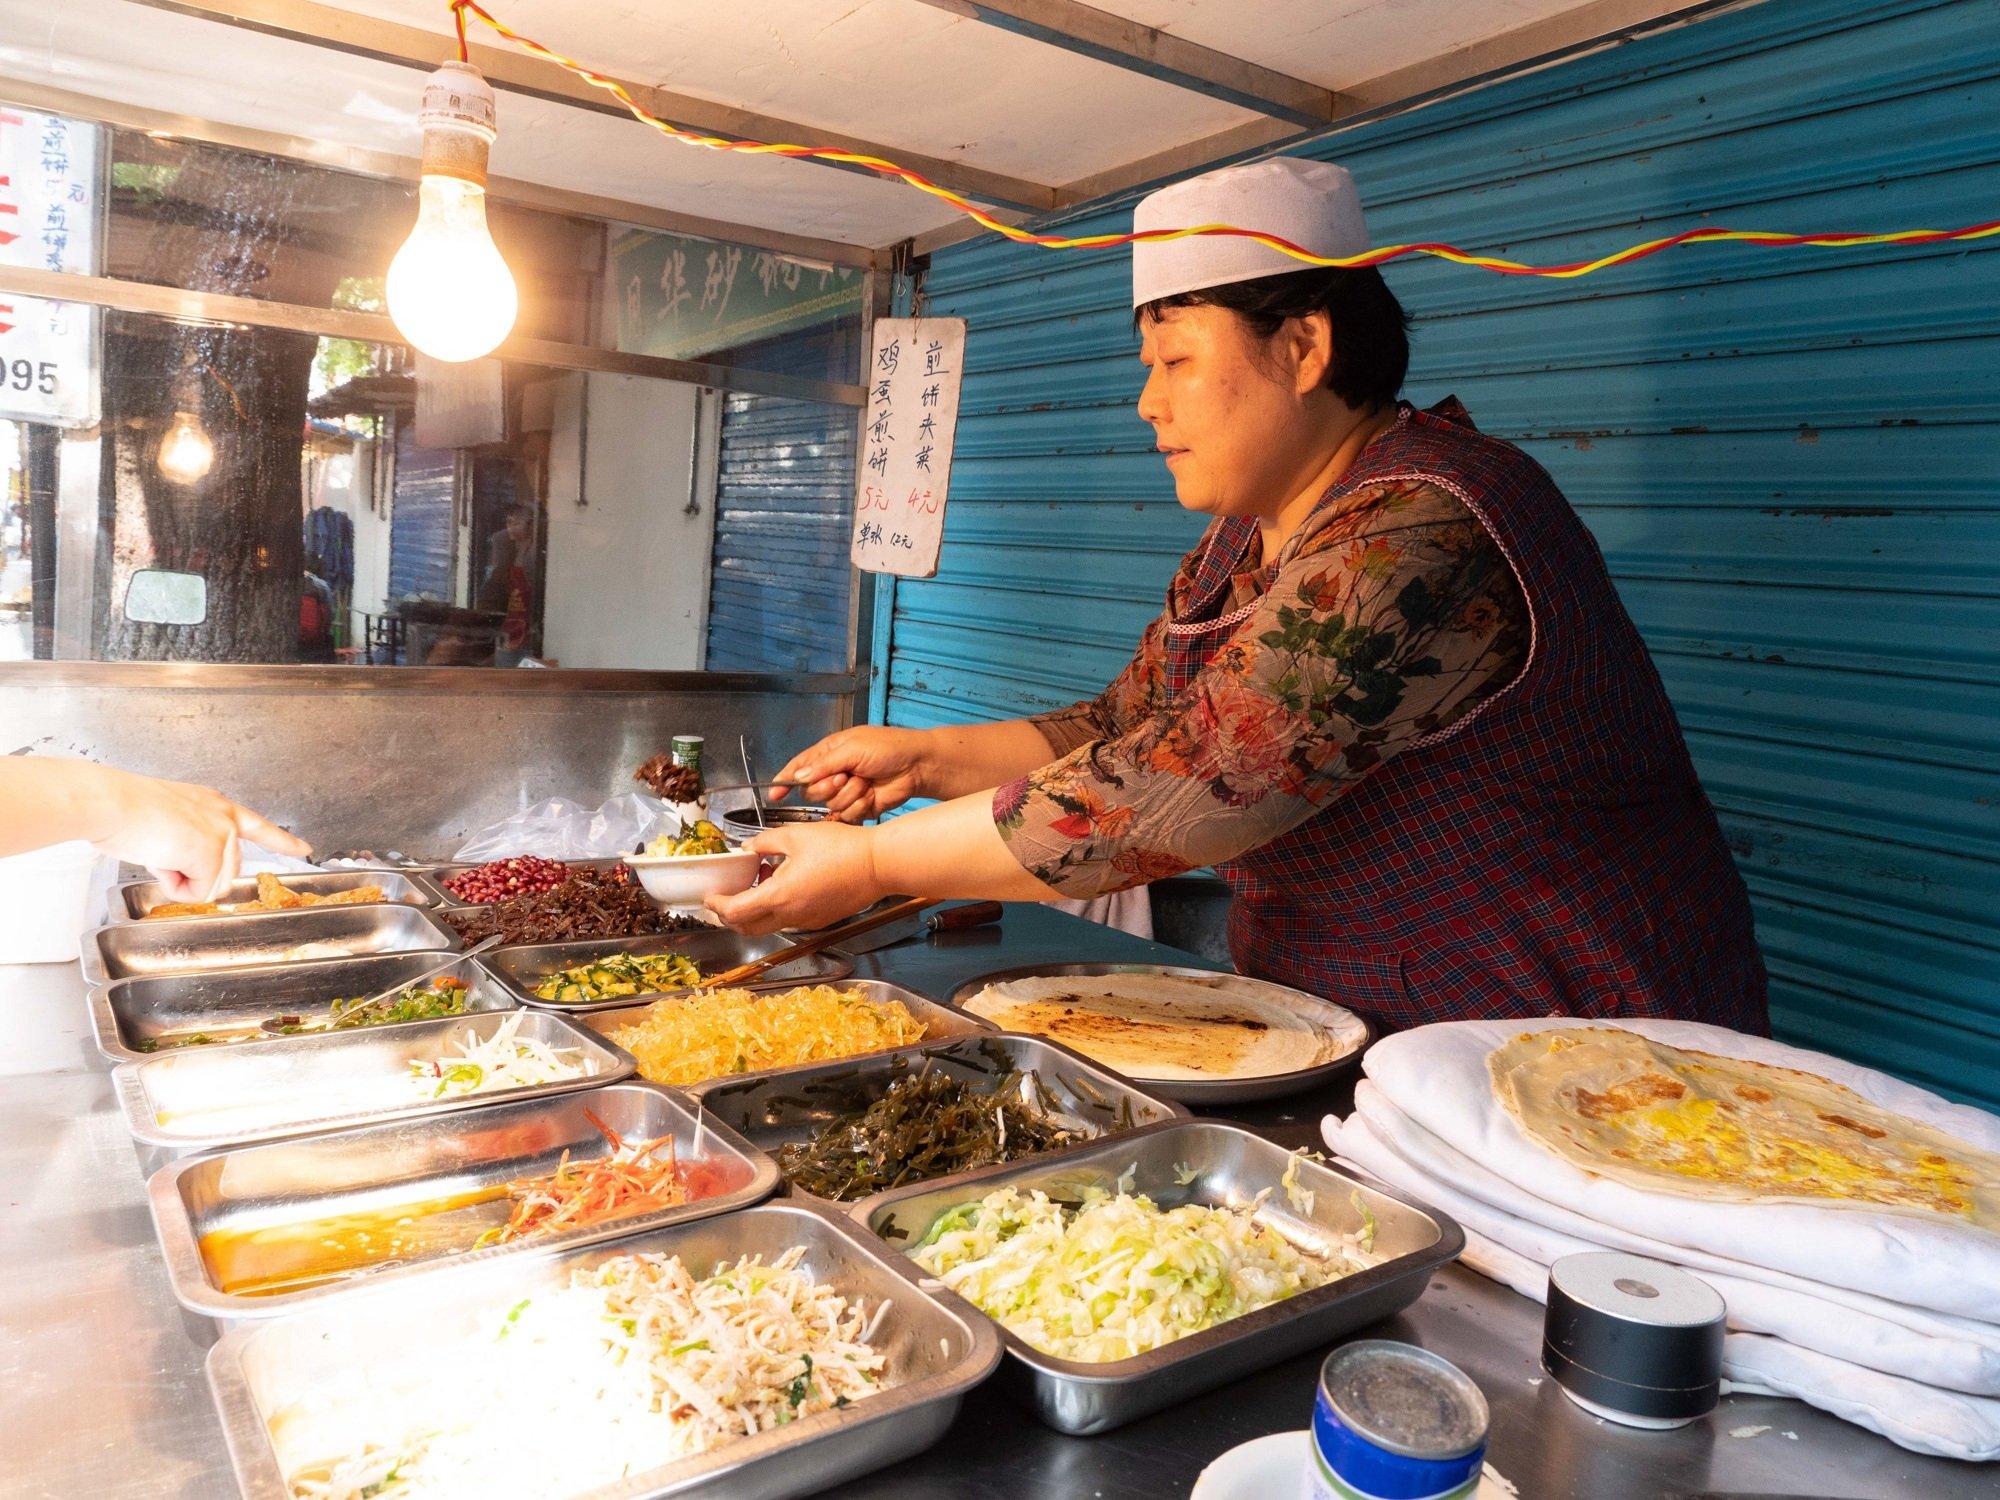 The Xi'an jianbing was one of my favourite street foods in Xi'an!